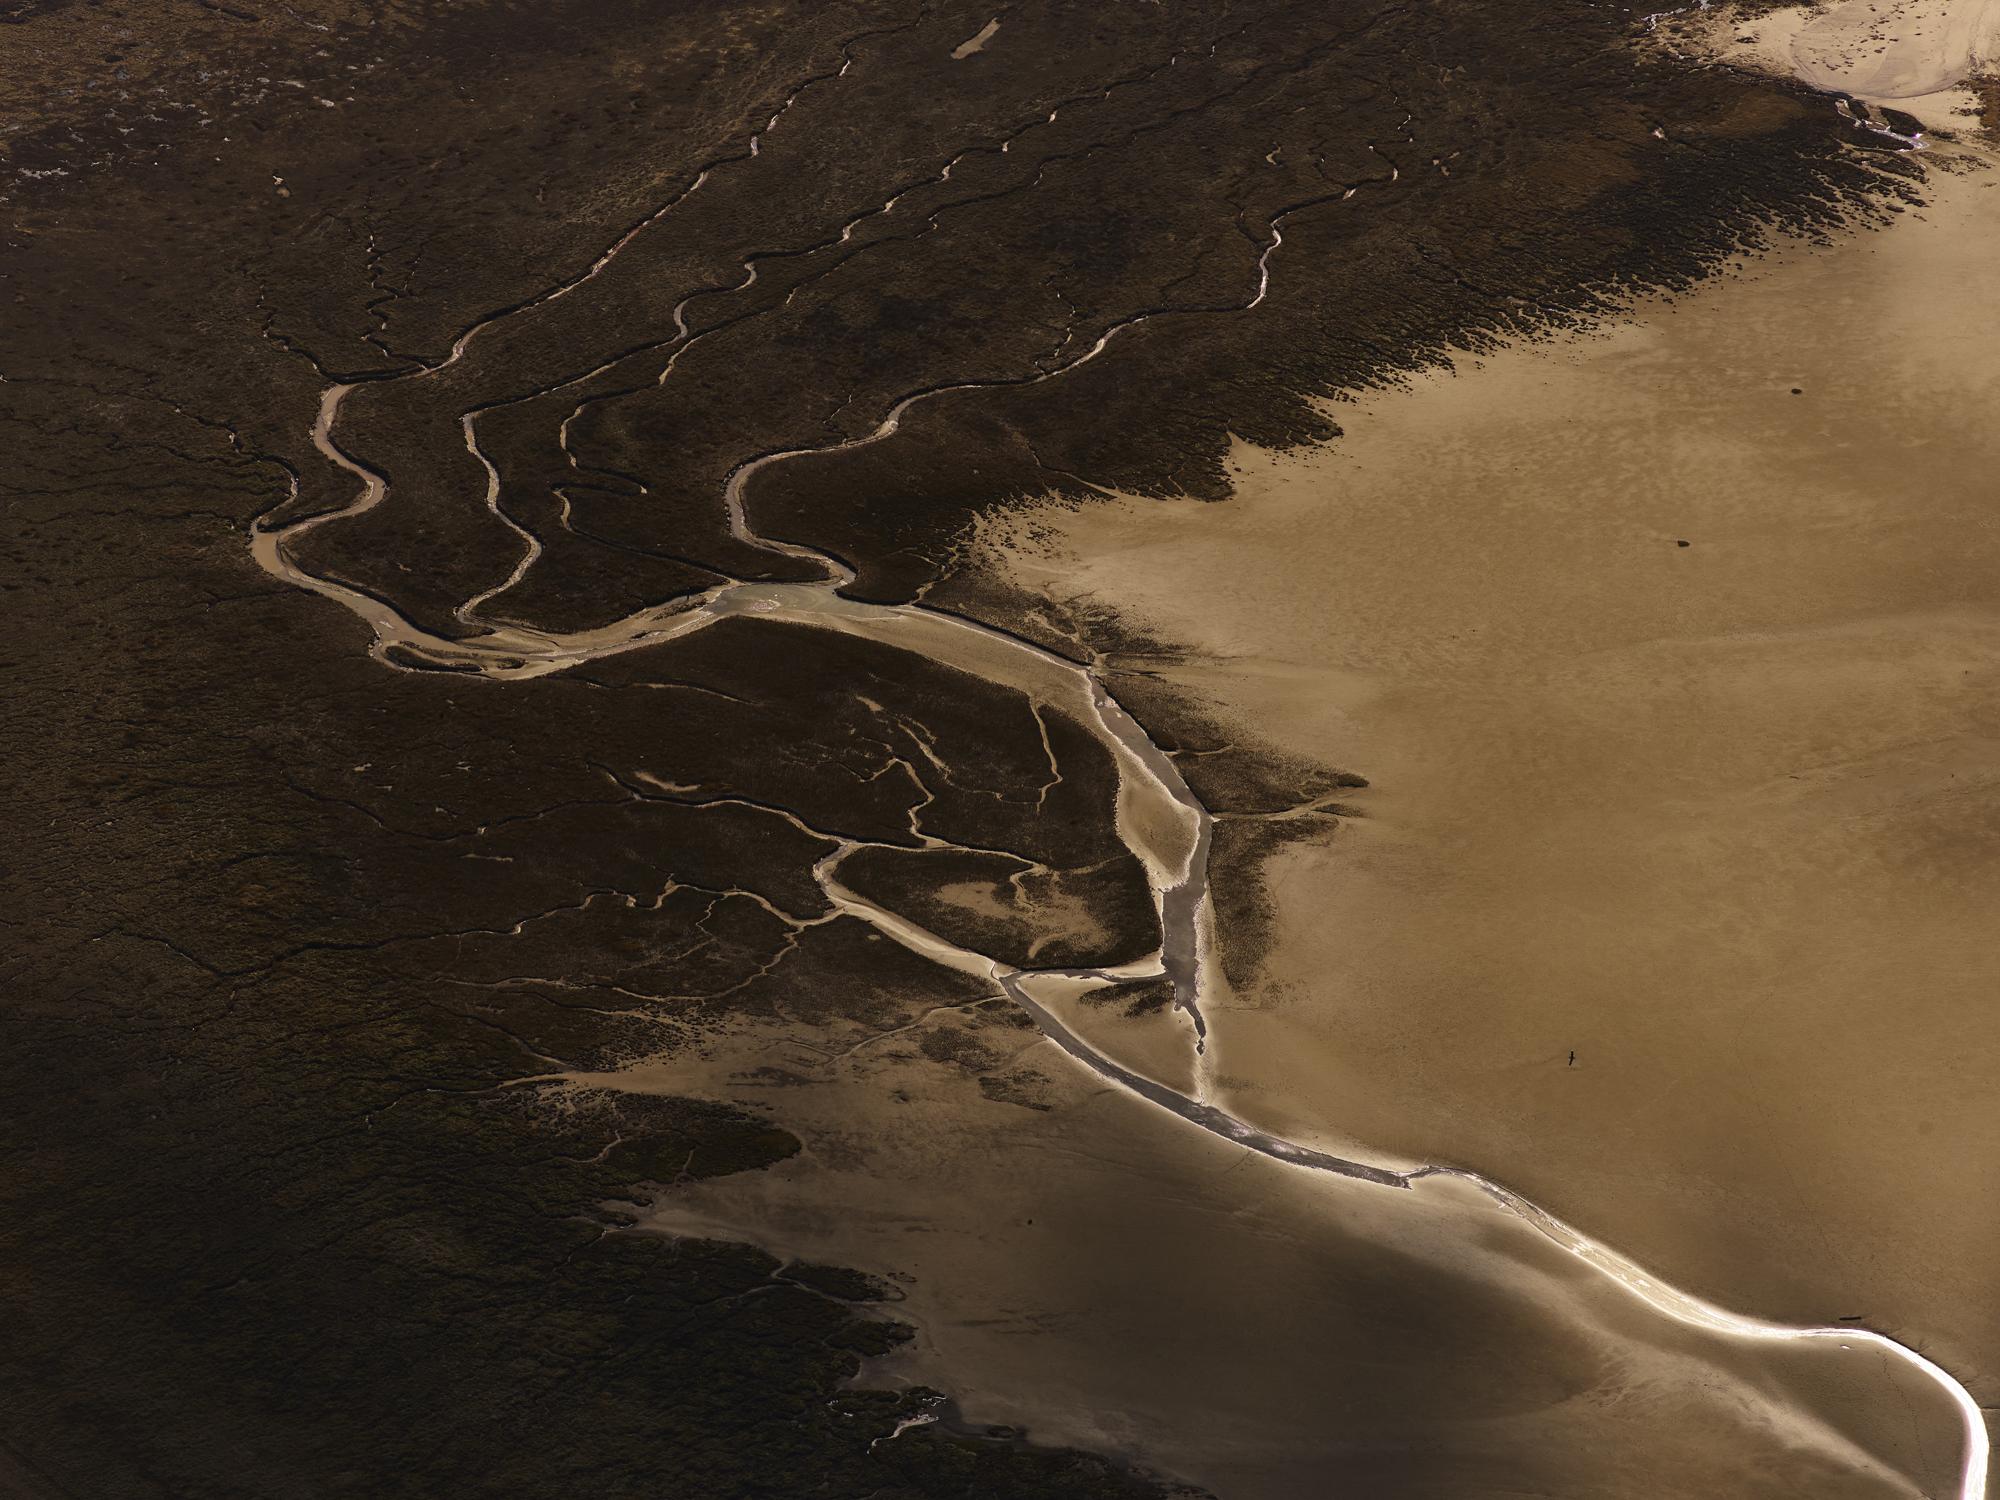 Vattenfall-Day-04-3585.jpg